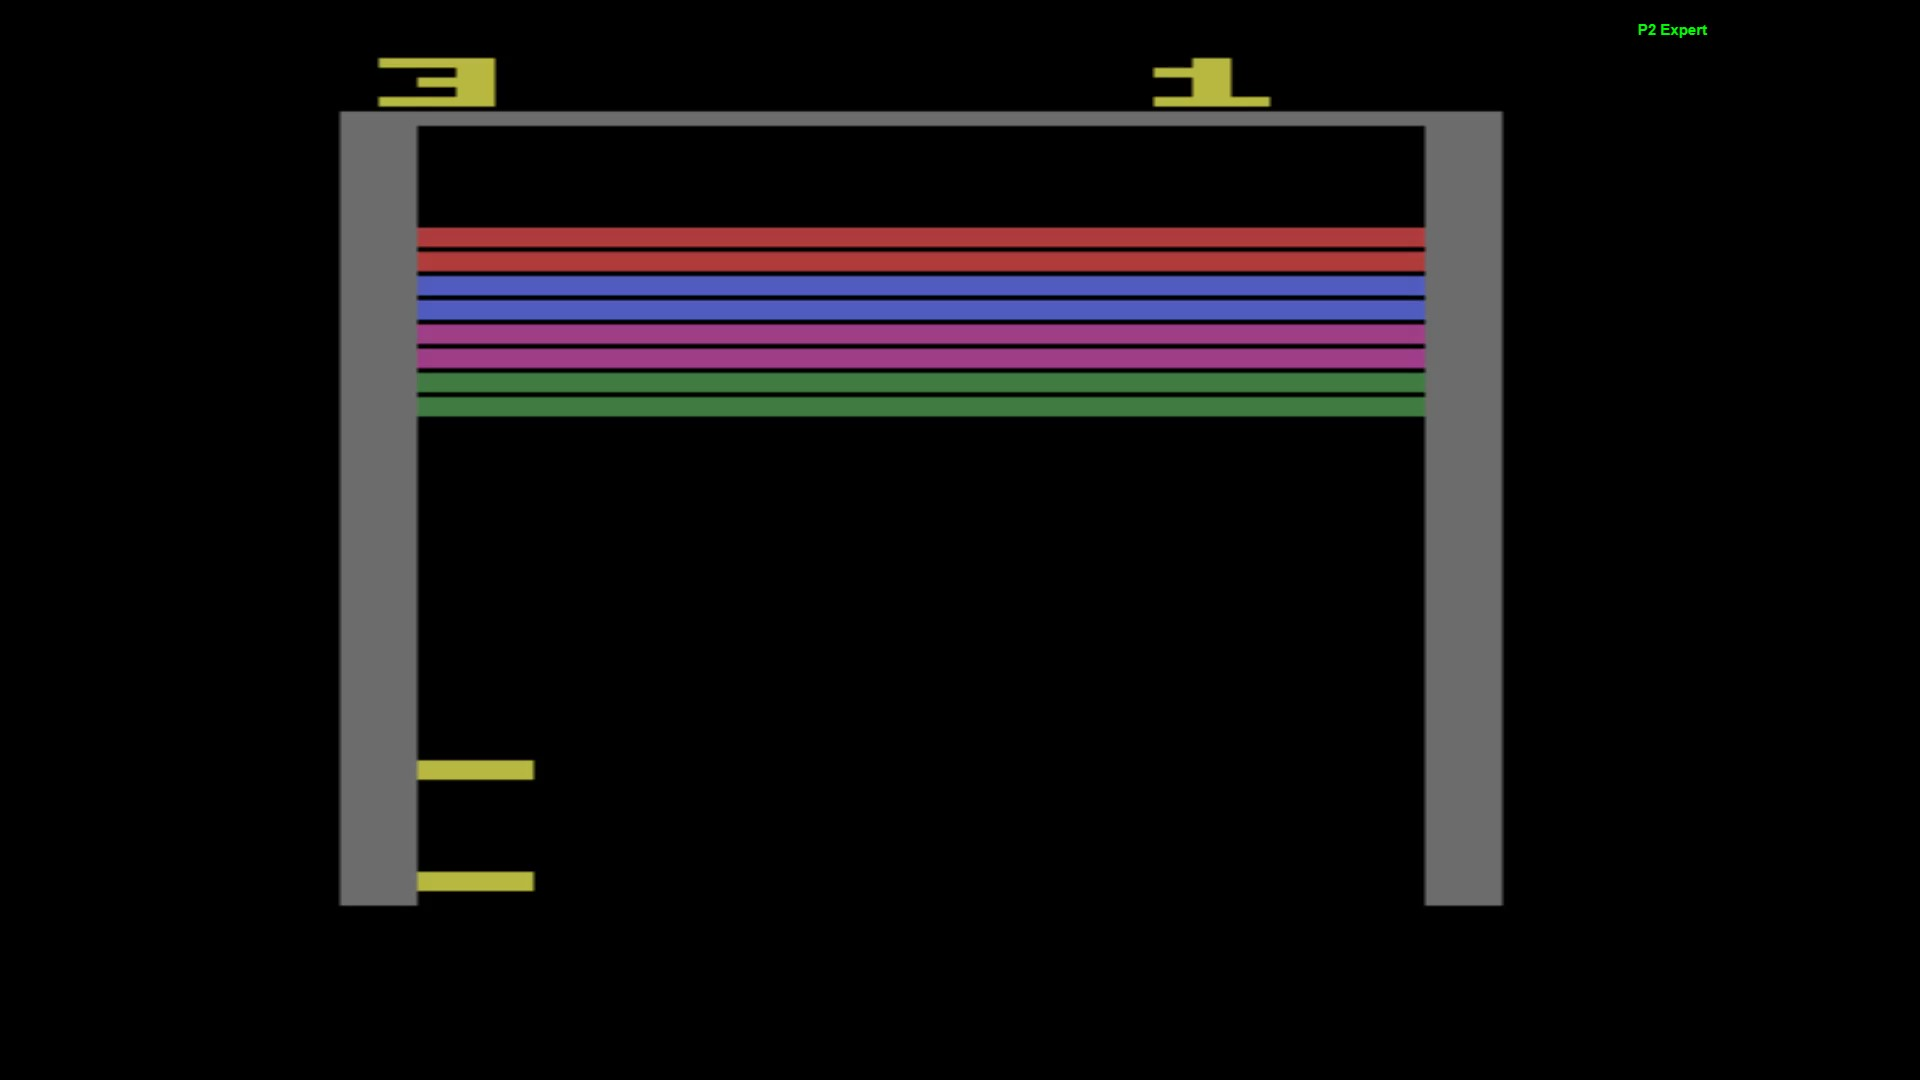 AkinNahtanoj: Super Breakout: Game 3 (Atari 2600 Emulated Expert/A Mode) 509 points on 2020-10-17 10:16:11